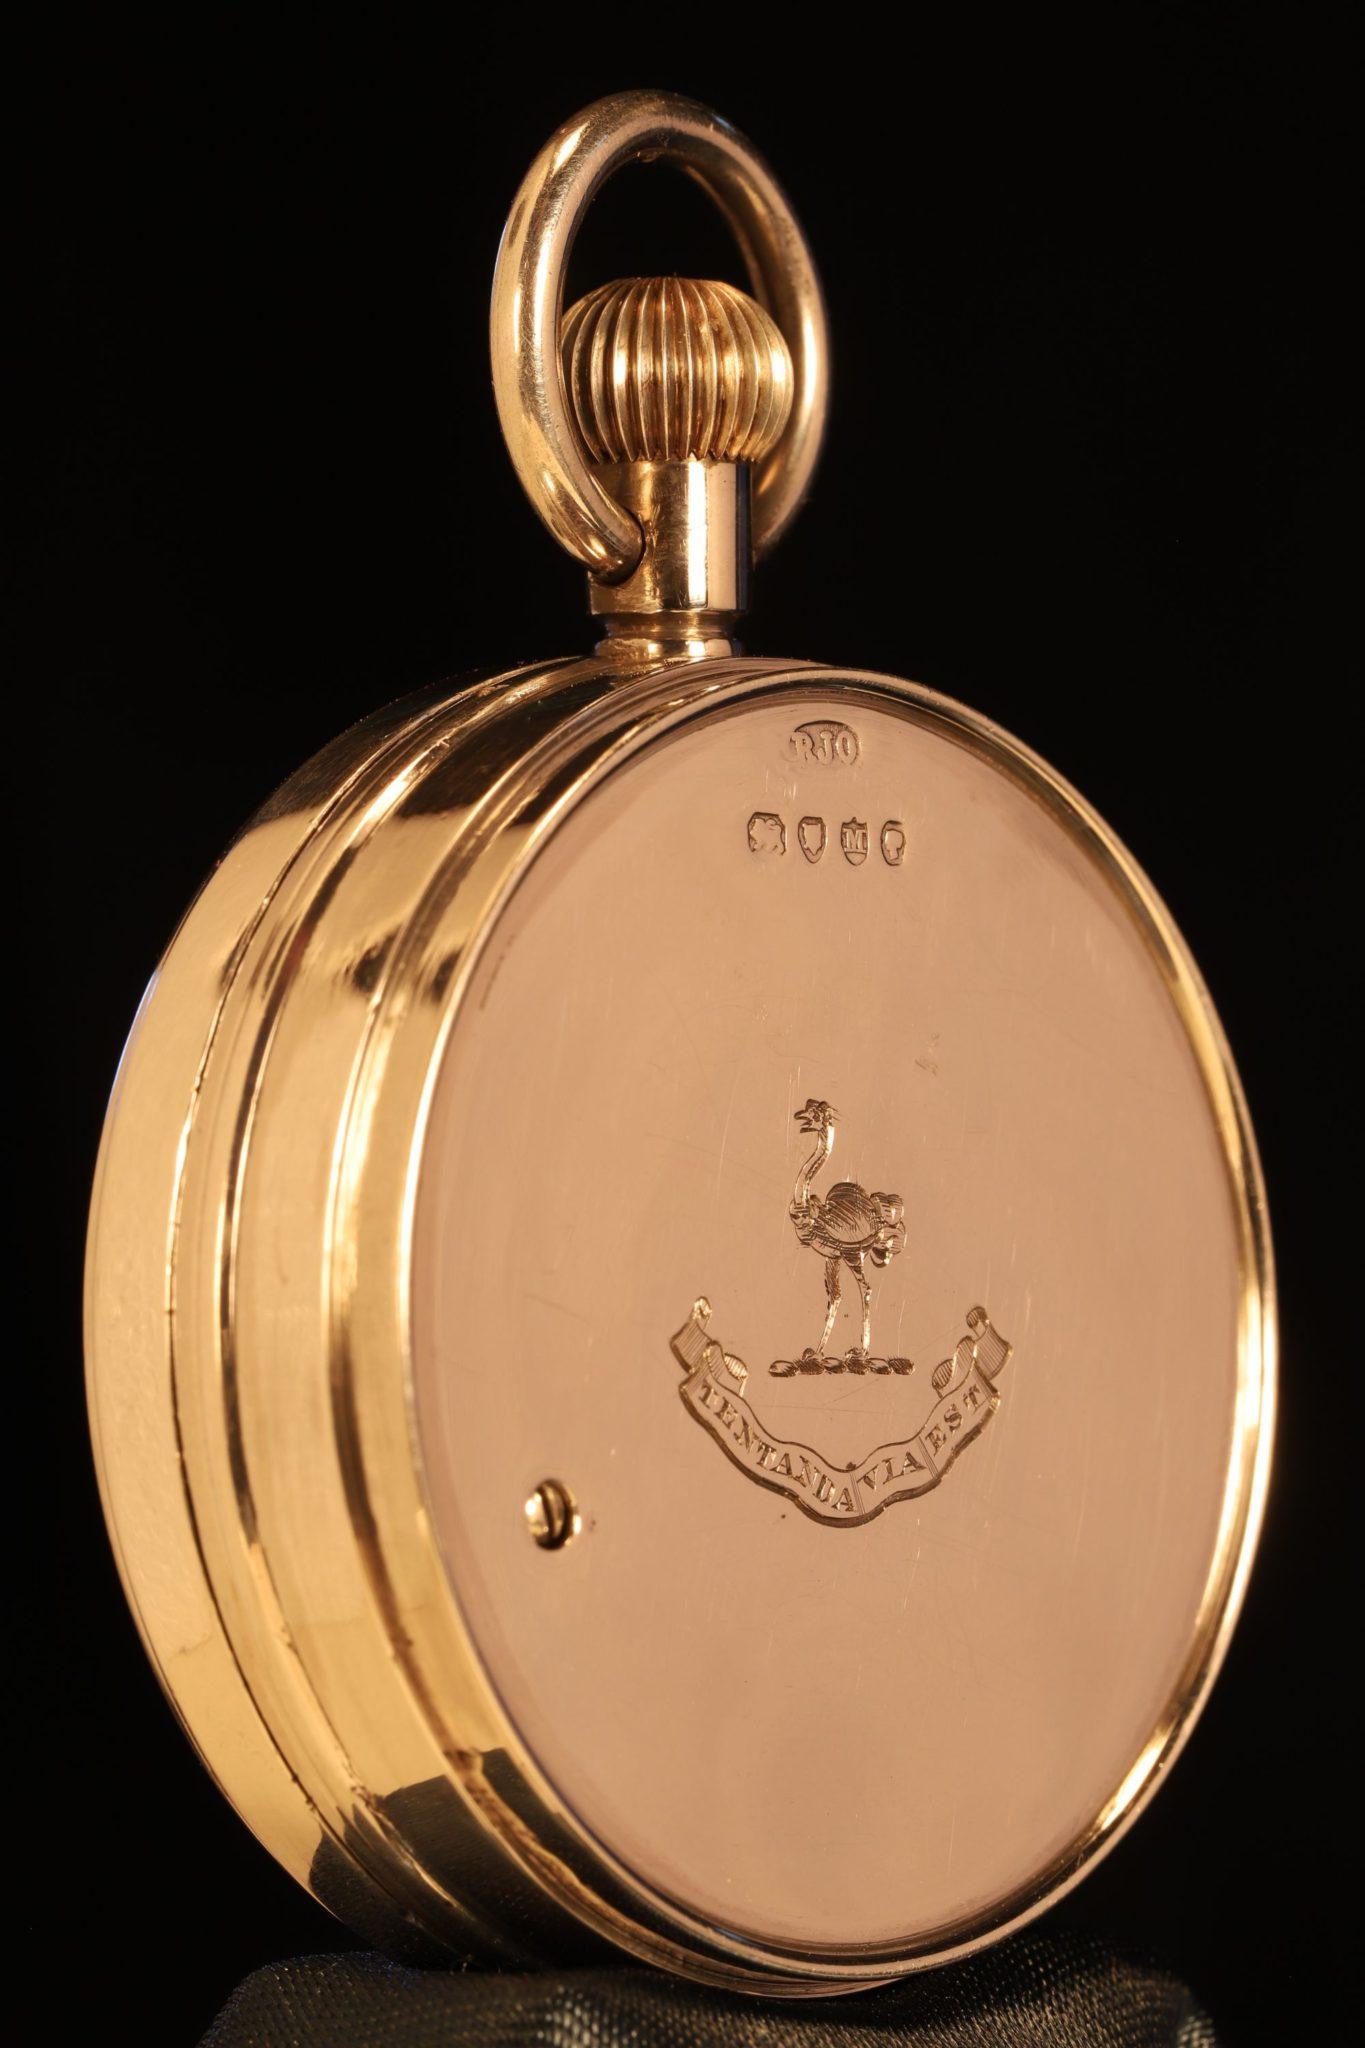 Image of Silver Pocket Barometer Compass Compendium c1887